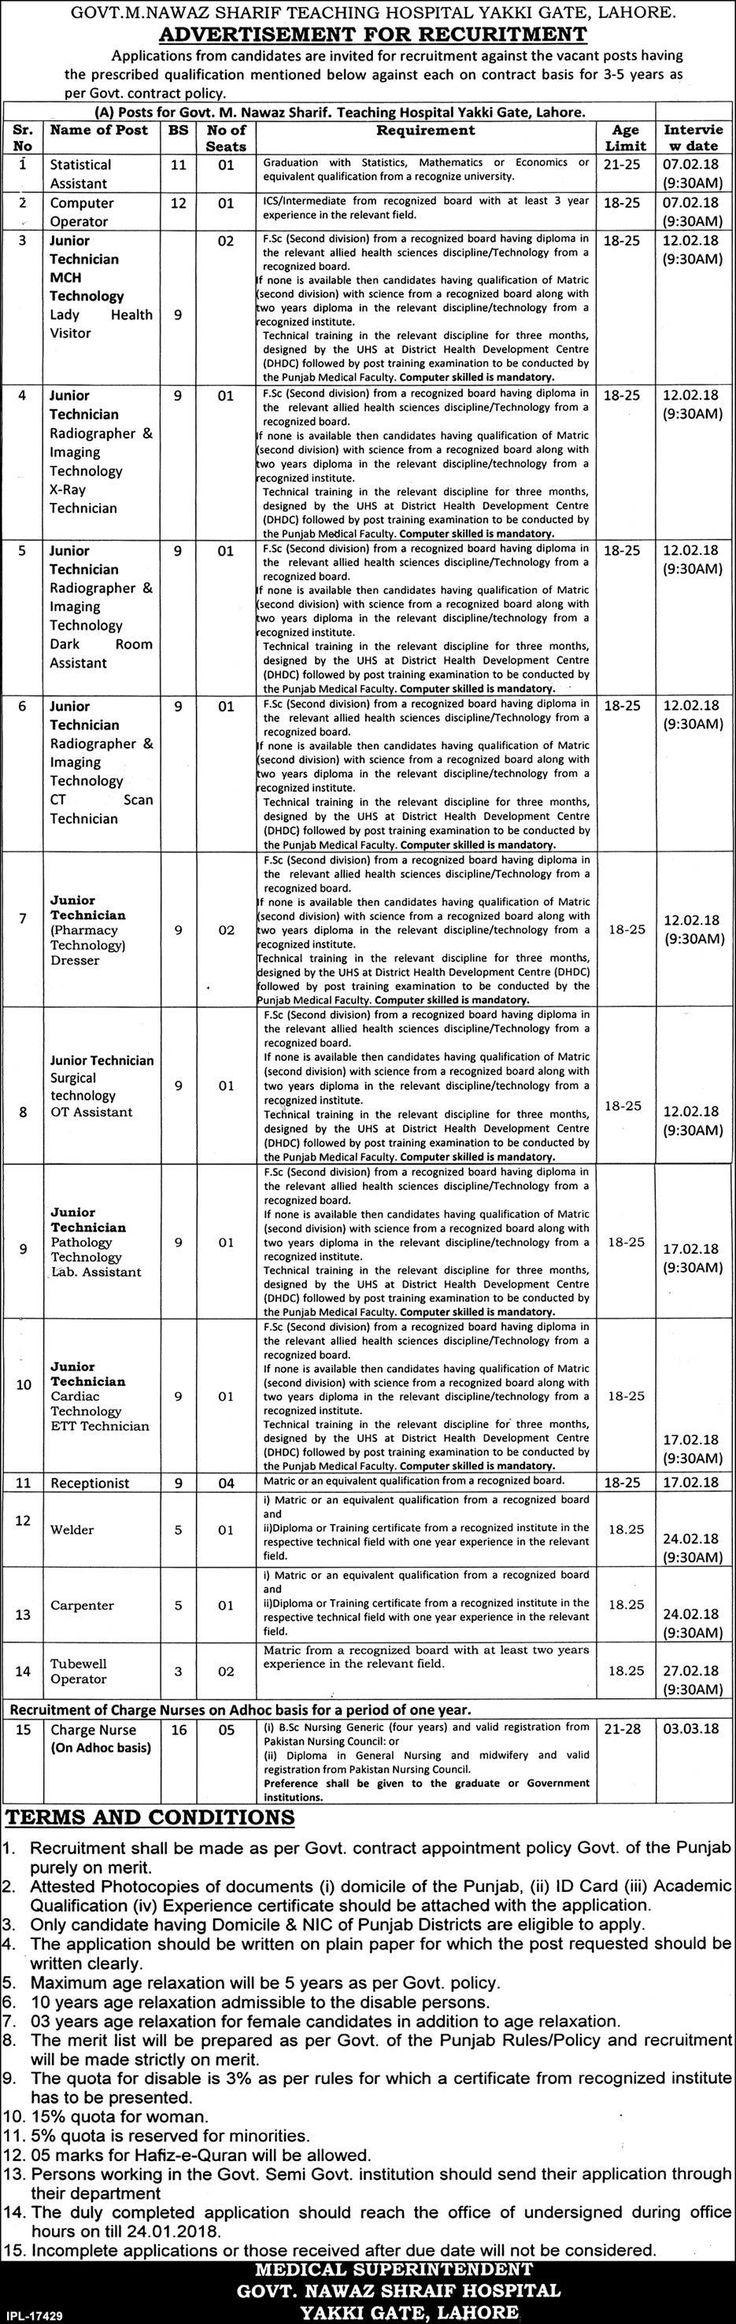 Government M Nawaz Sharif Teaching Hospital Jobs 2018 In Lahore For Computer Operator And Junior Technicians http://www.jobsfanda.com/government-m-nawaz-sharif-teaching-hospital-jobs-2018-in-lahore-for-computer-operator-and-junior-technicians/